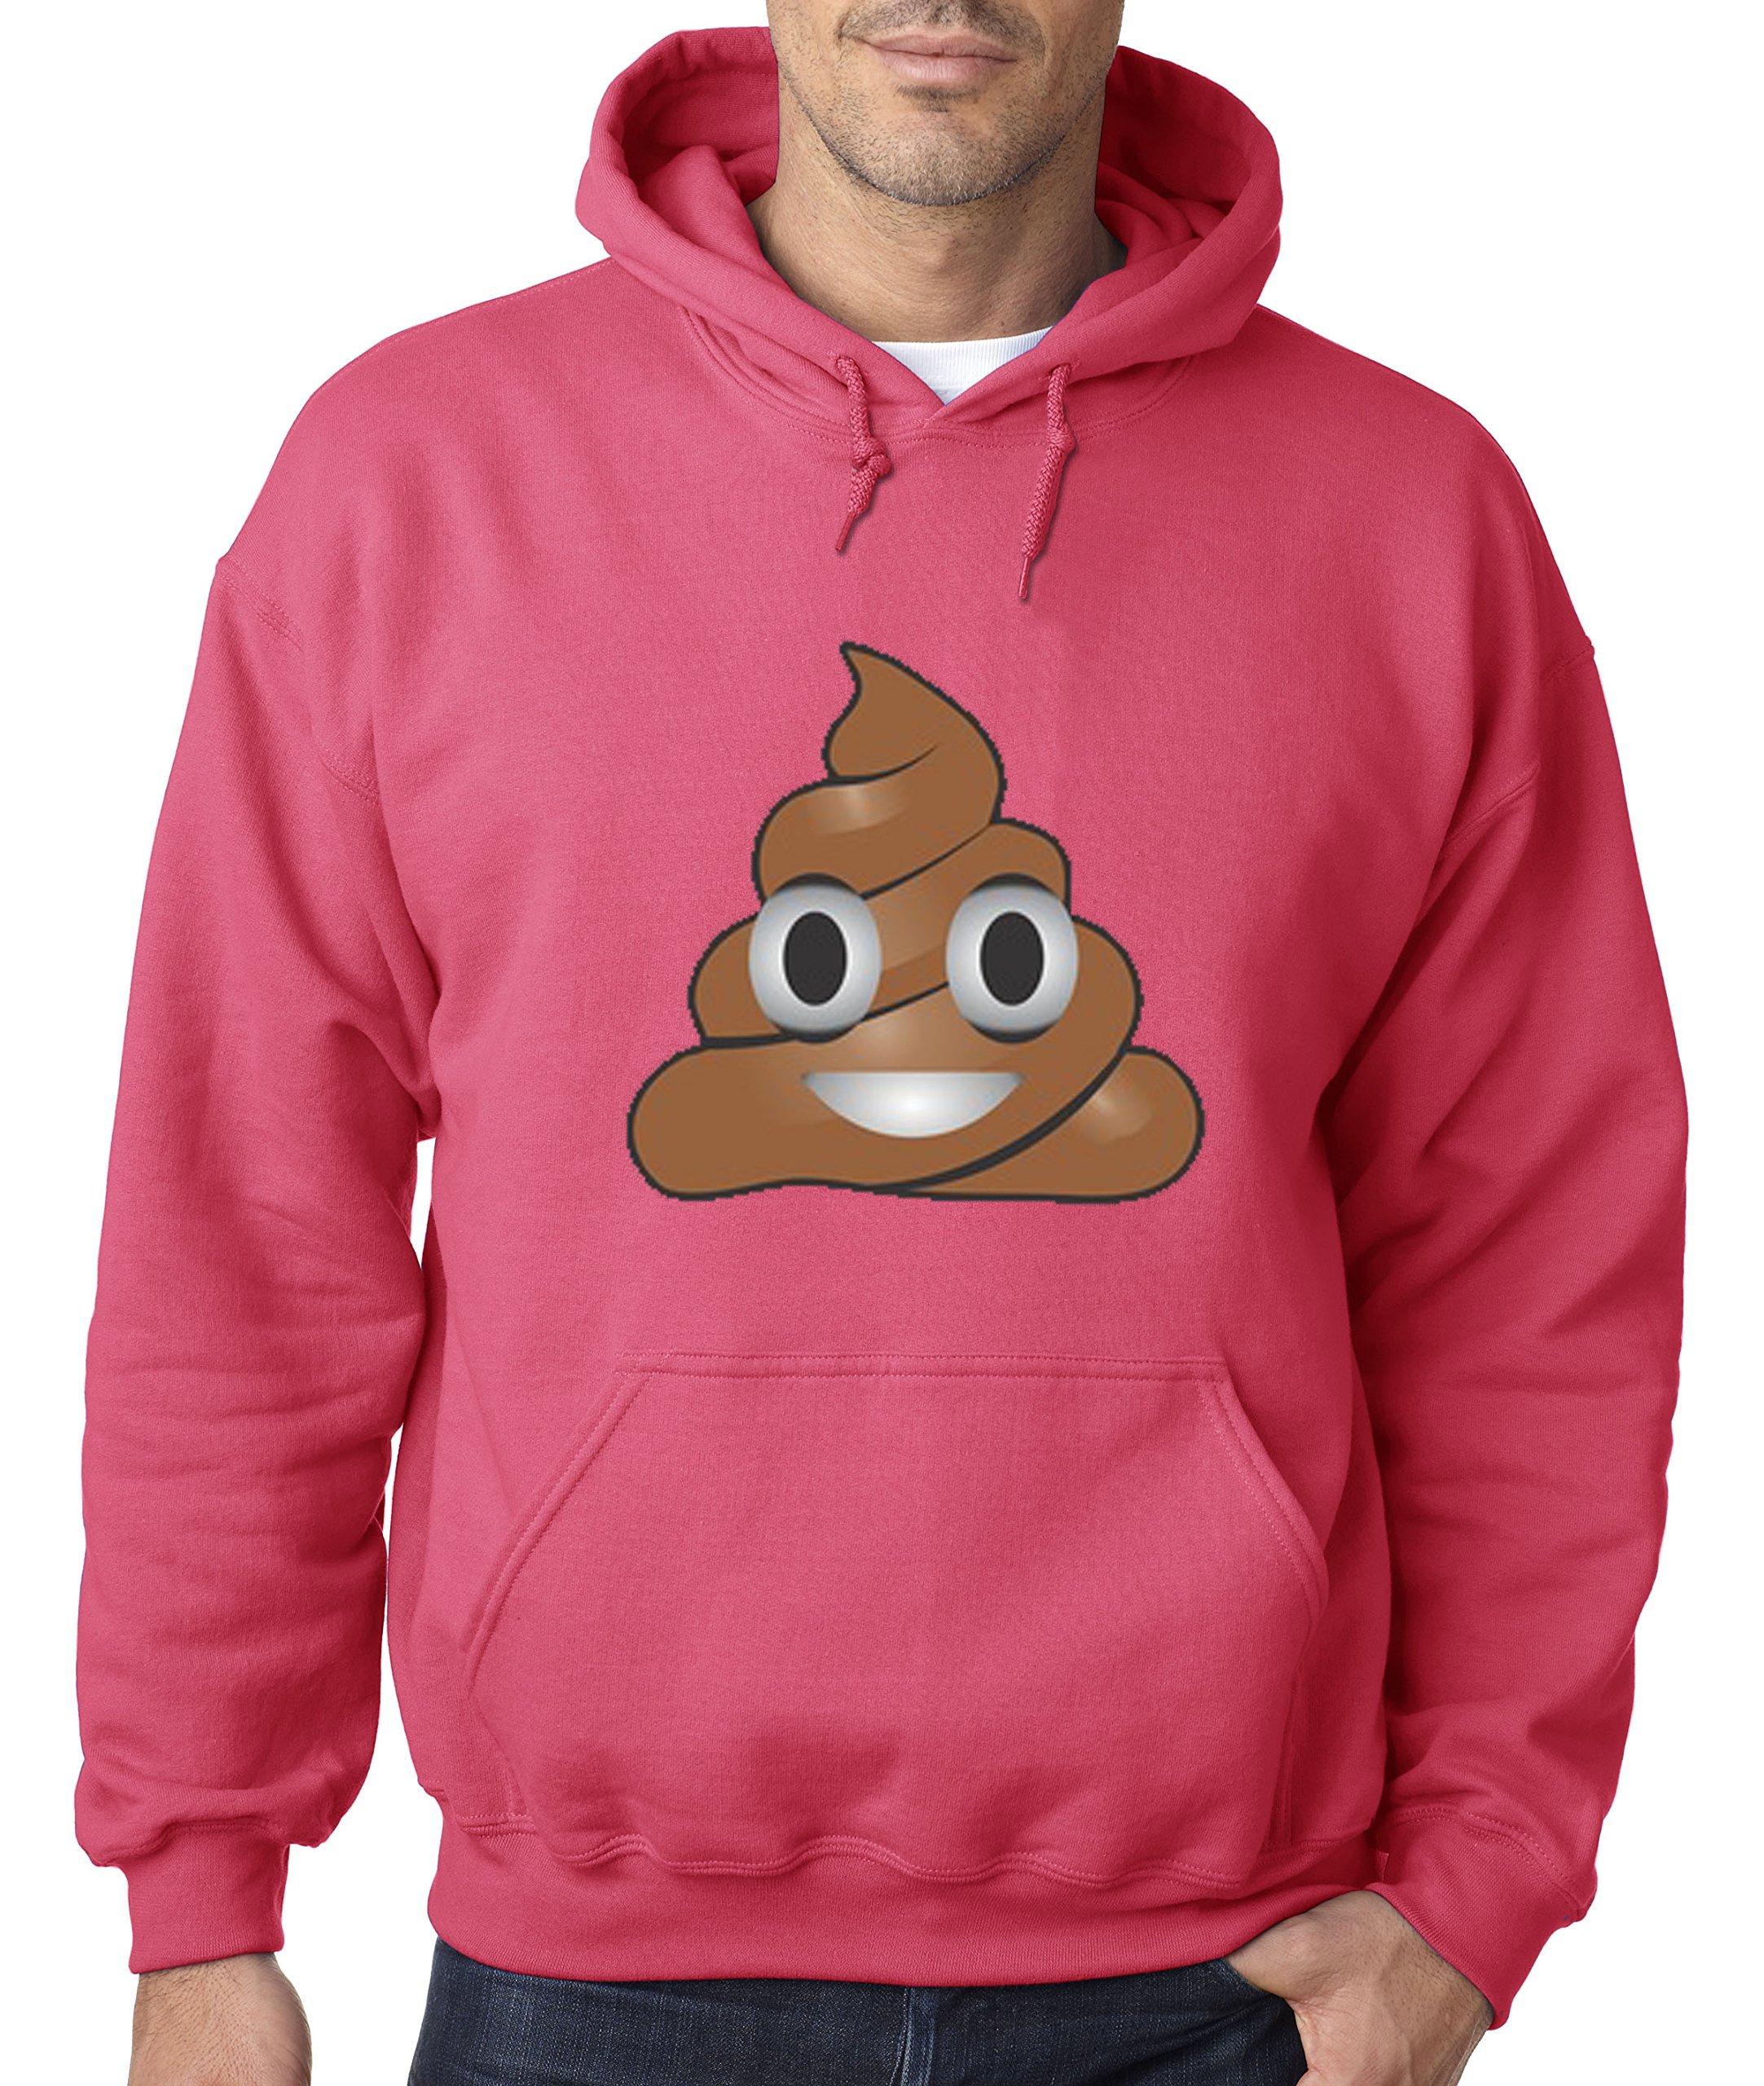 119 Emoji Poop Cartoon Poo Unisex Pullover 7873 Shirts